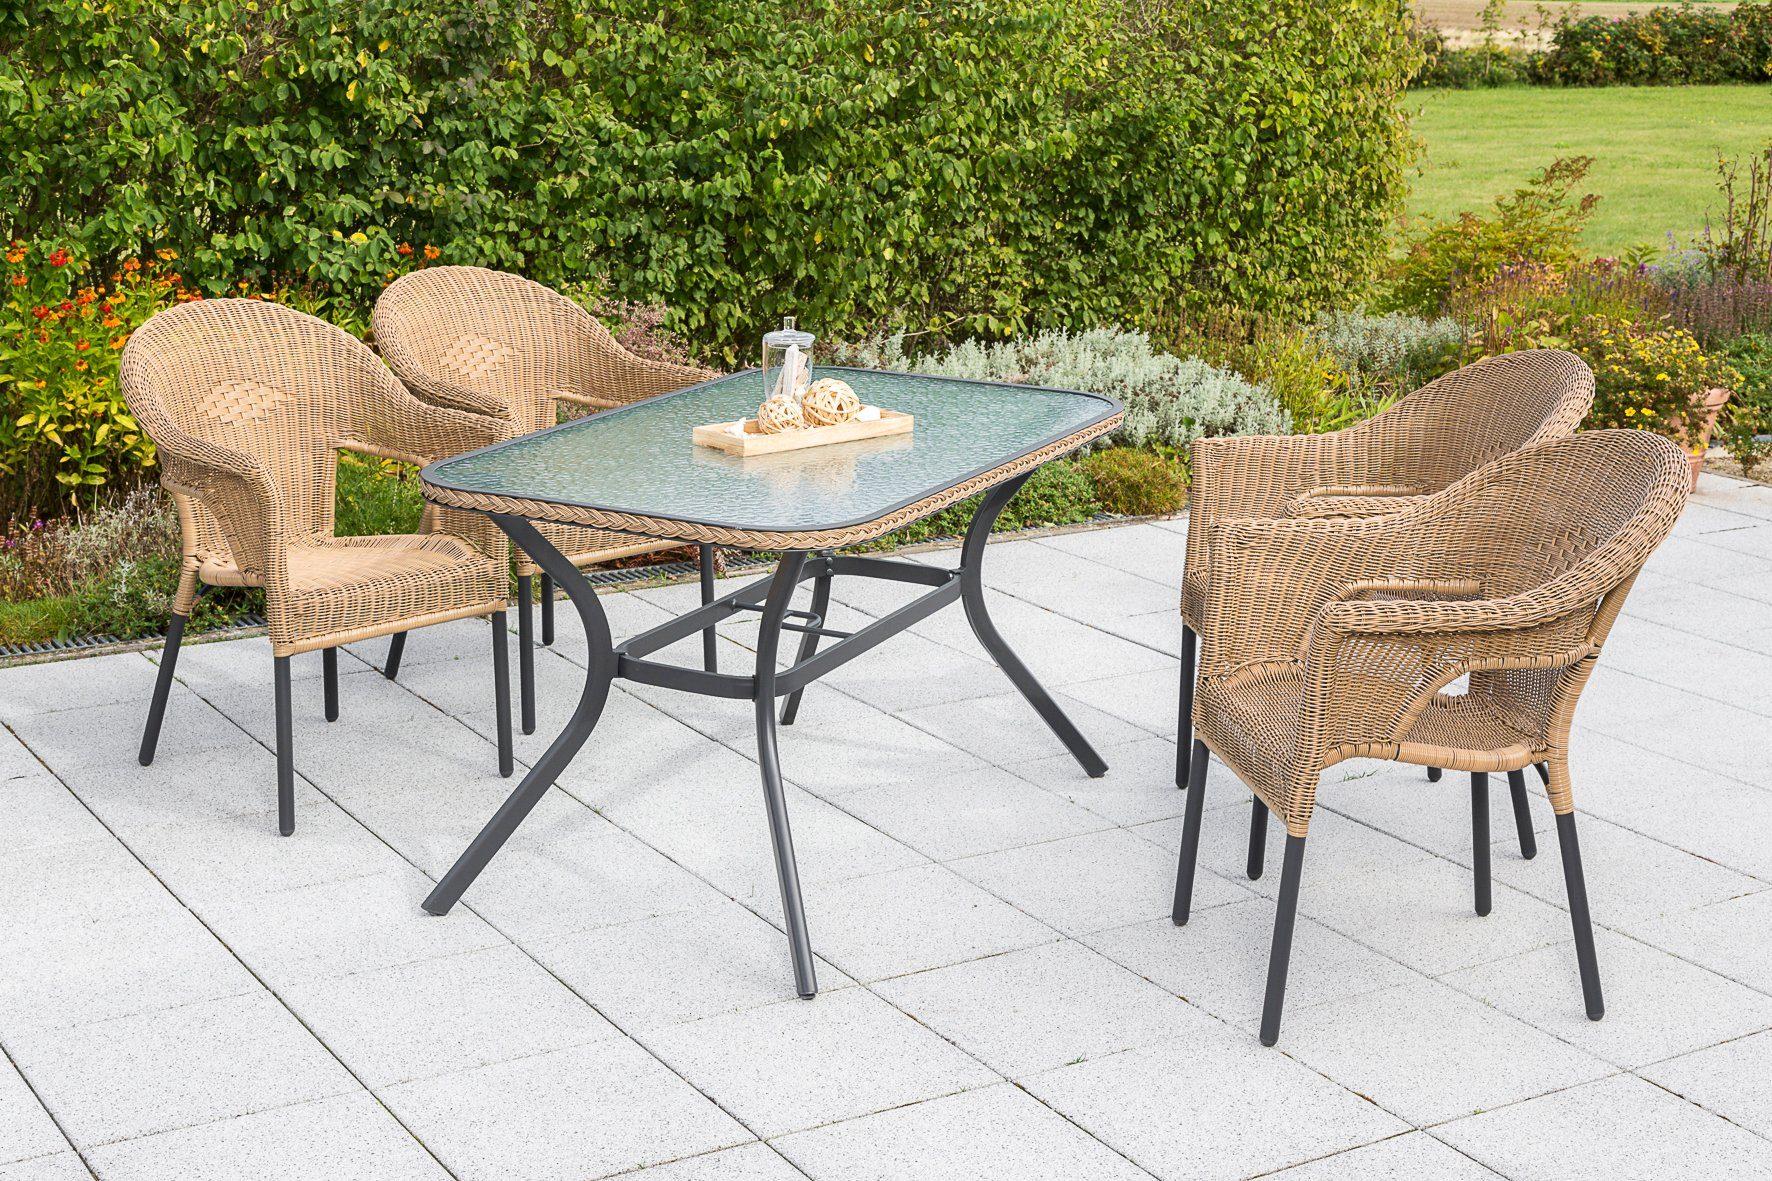 MERXX Gartenmöbelset »Ravenna«, 5tlg., 4 Sessel, Tisch, stapelbar, Polyrattan